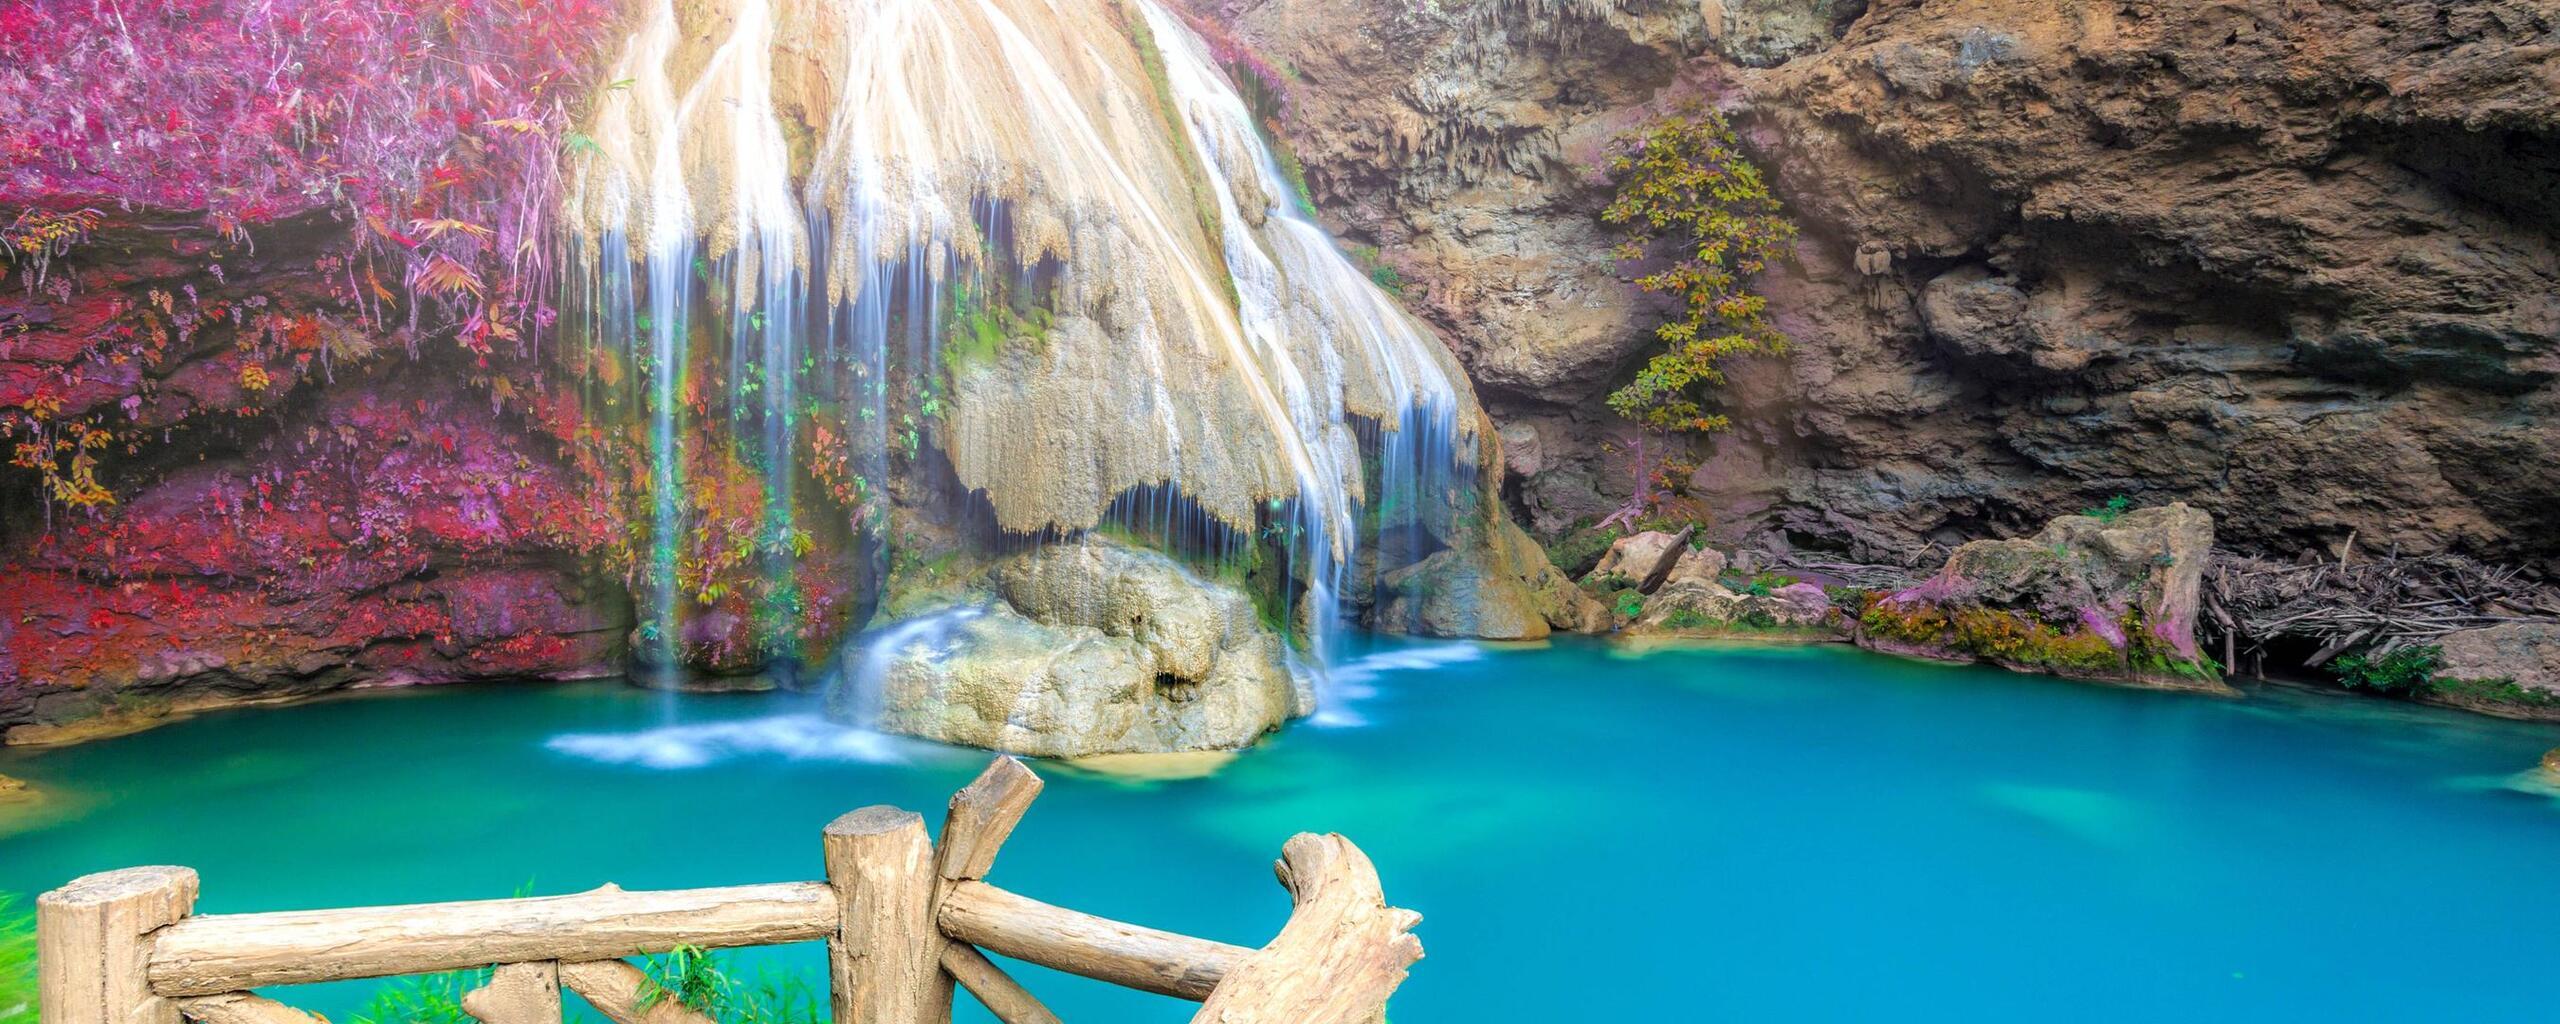 beautiful-waterfall-in-thailand-new.jpg